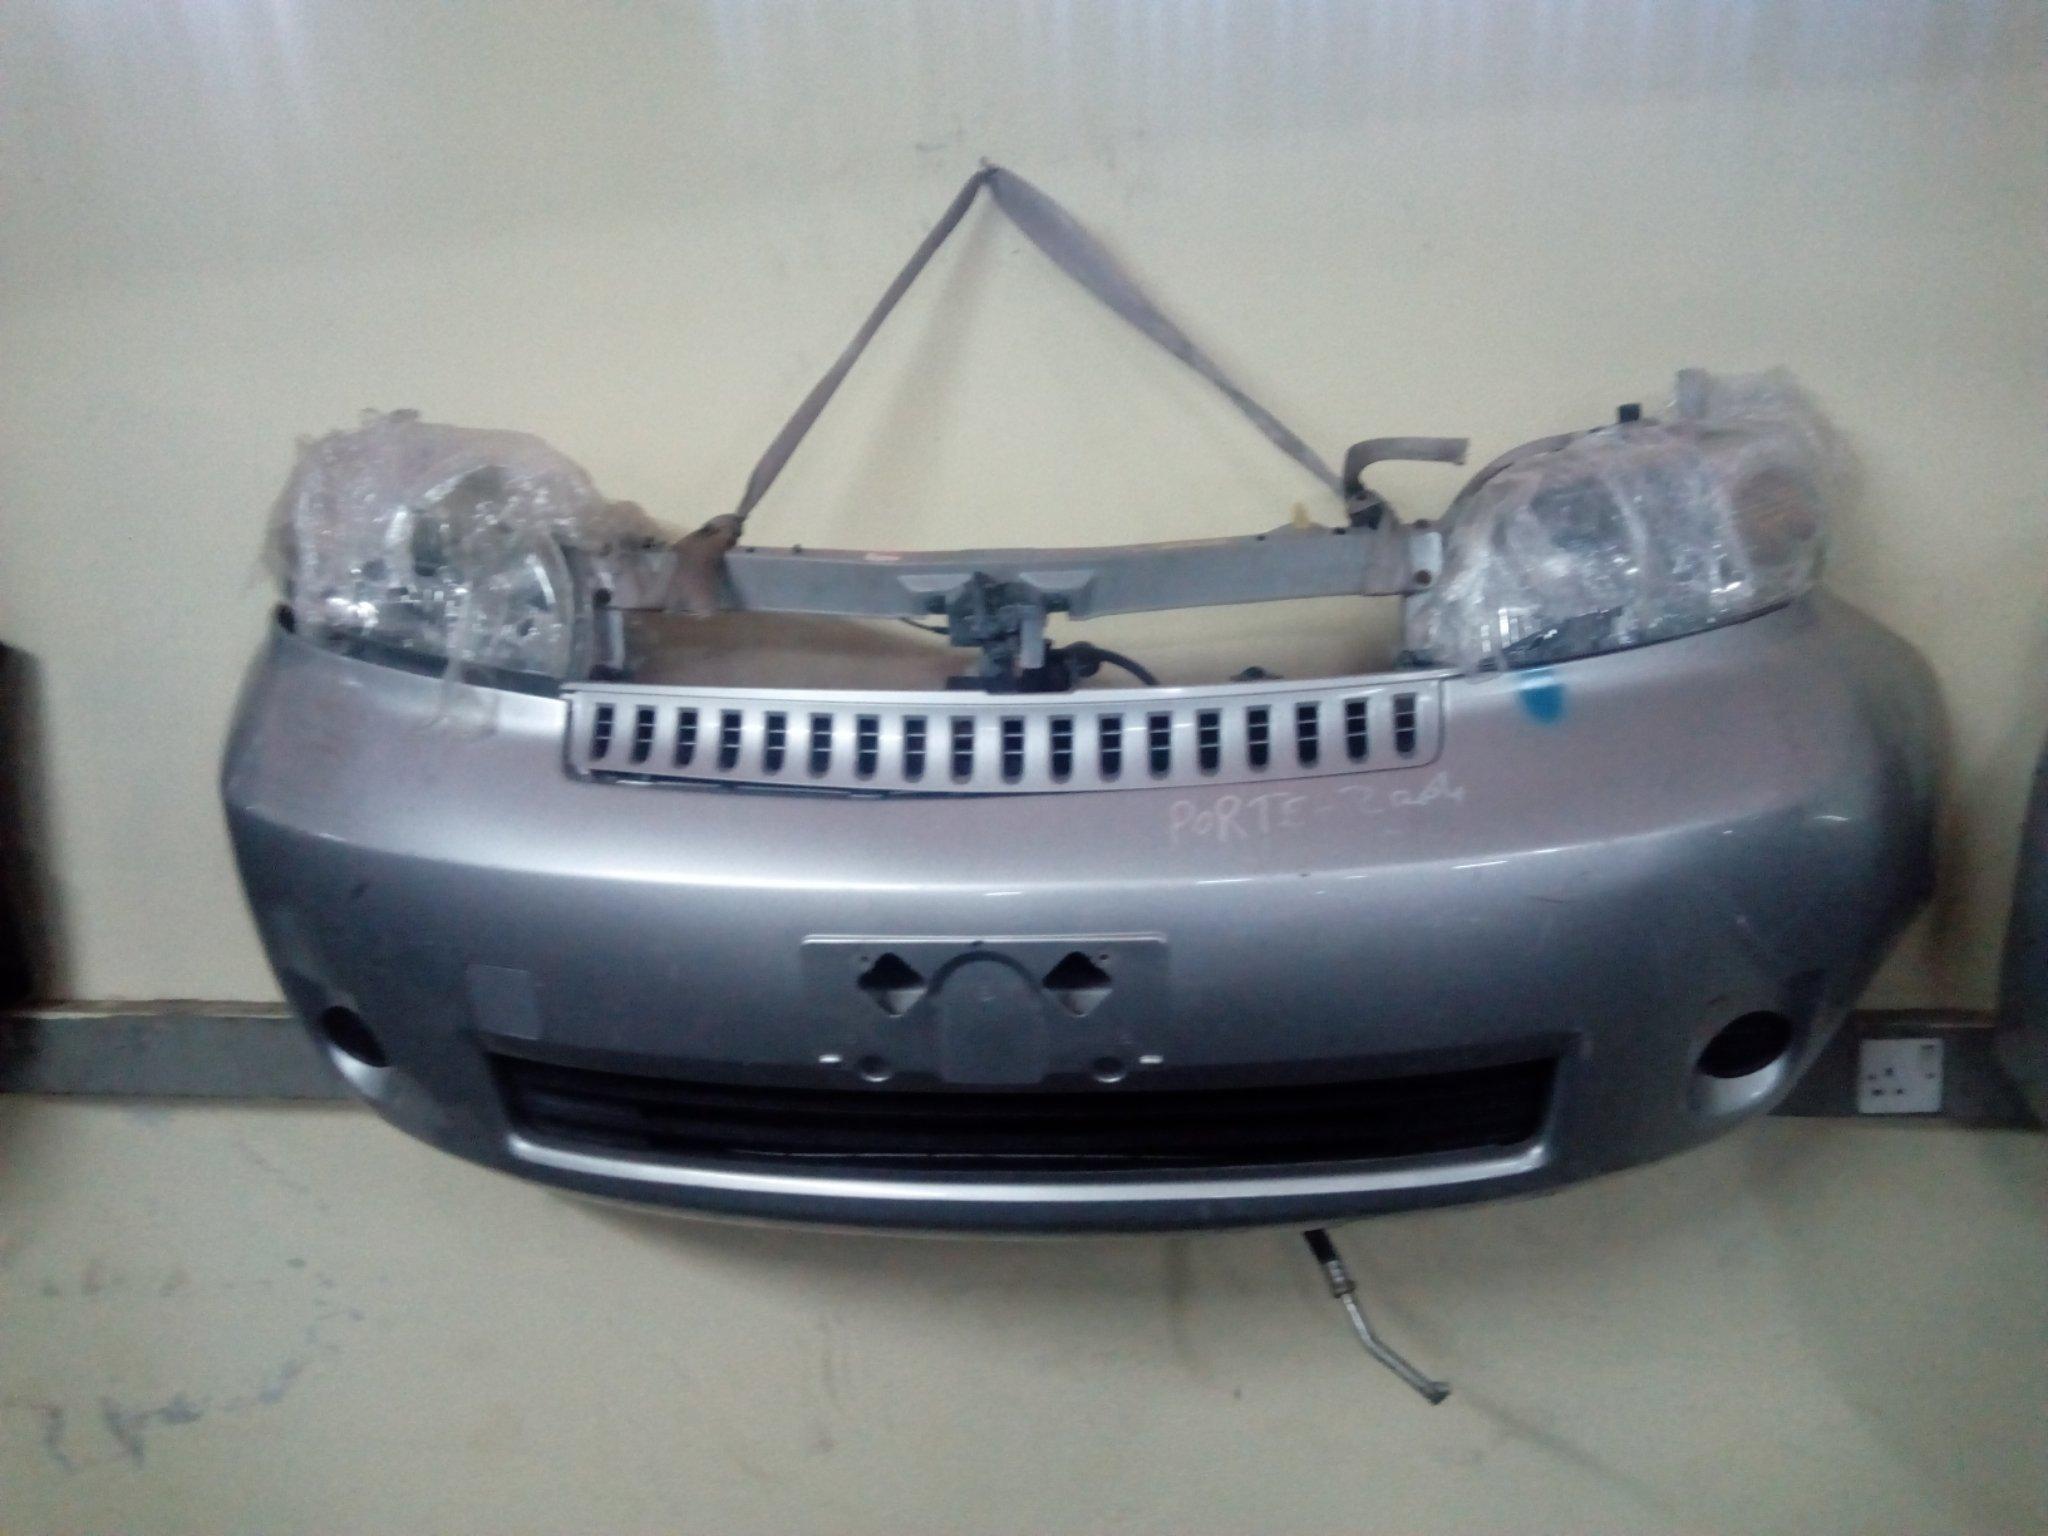 Toyota Porte- ZR- 04 nosecut 00875